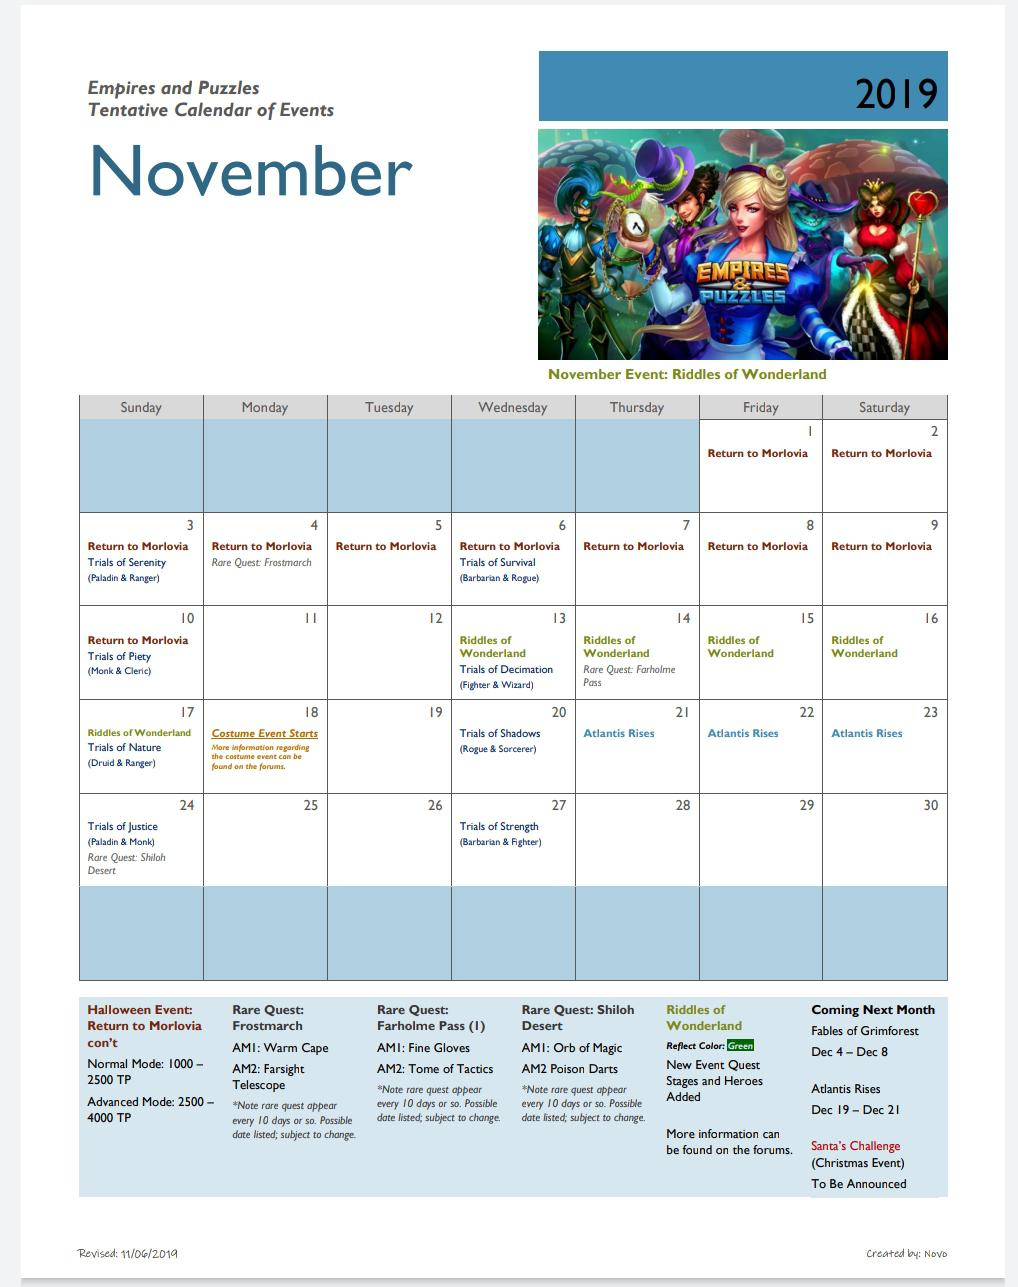 Upated November Calendar : Empiresandpuzzles pertaining to Calendar Empires And Puzzles